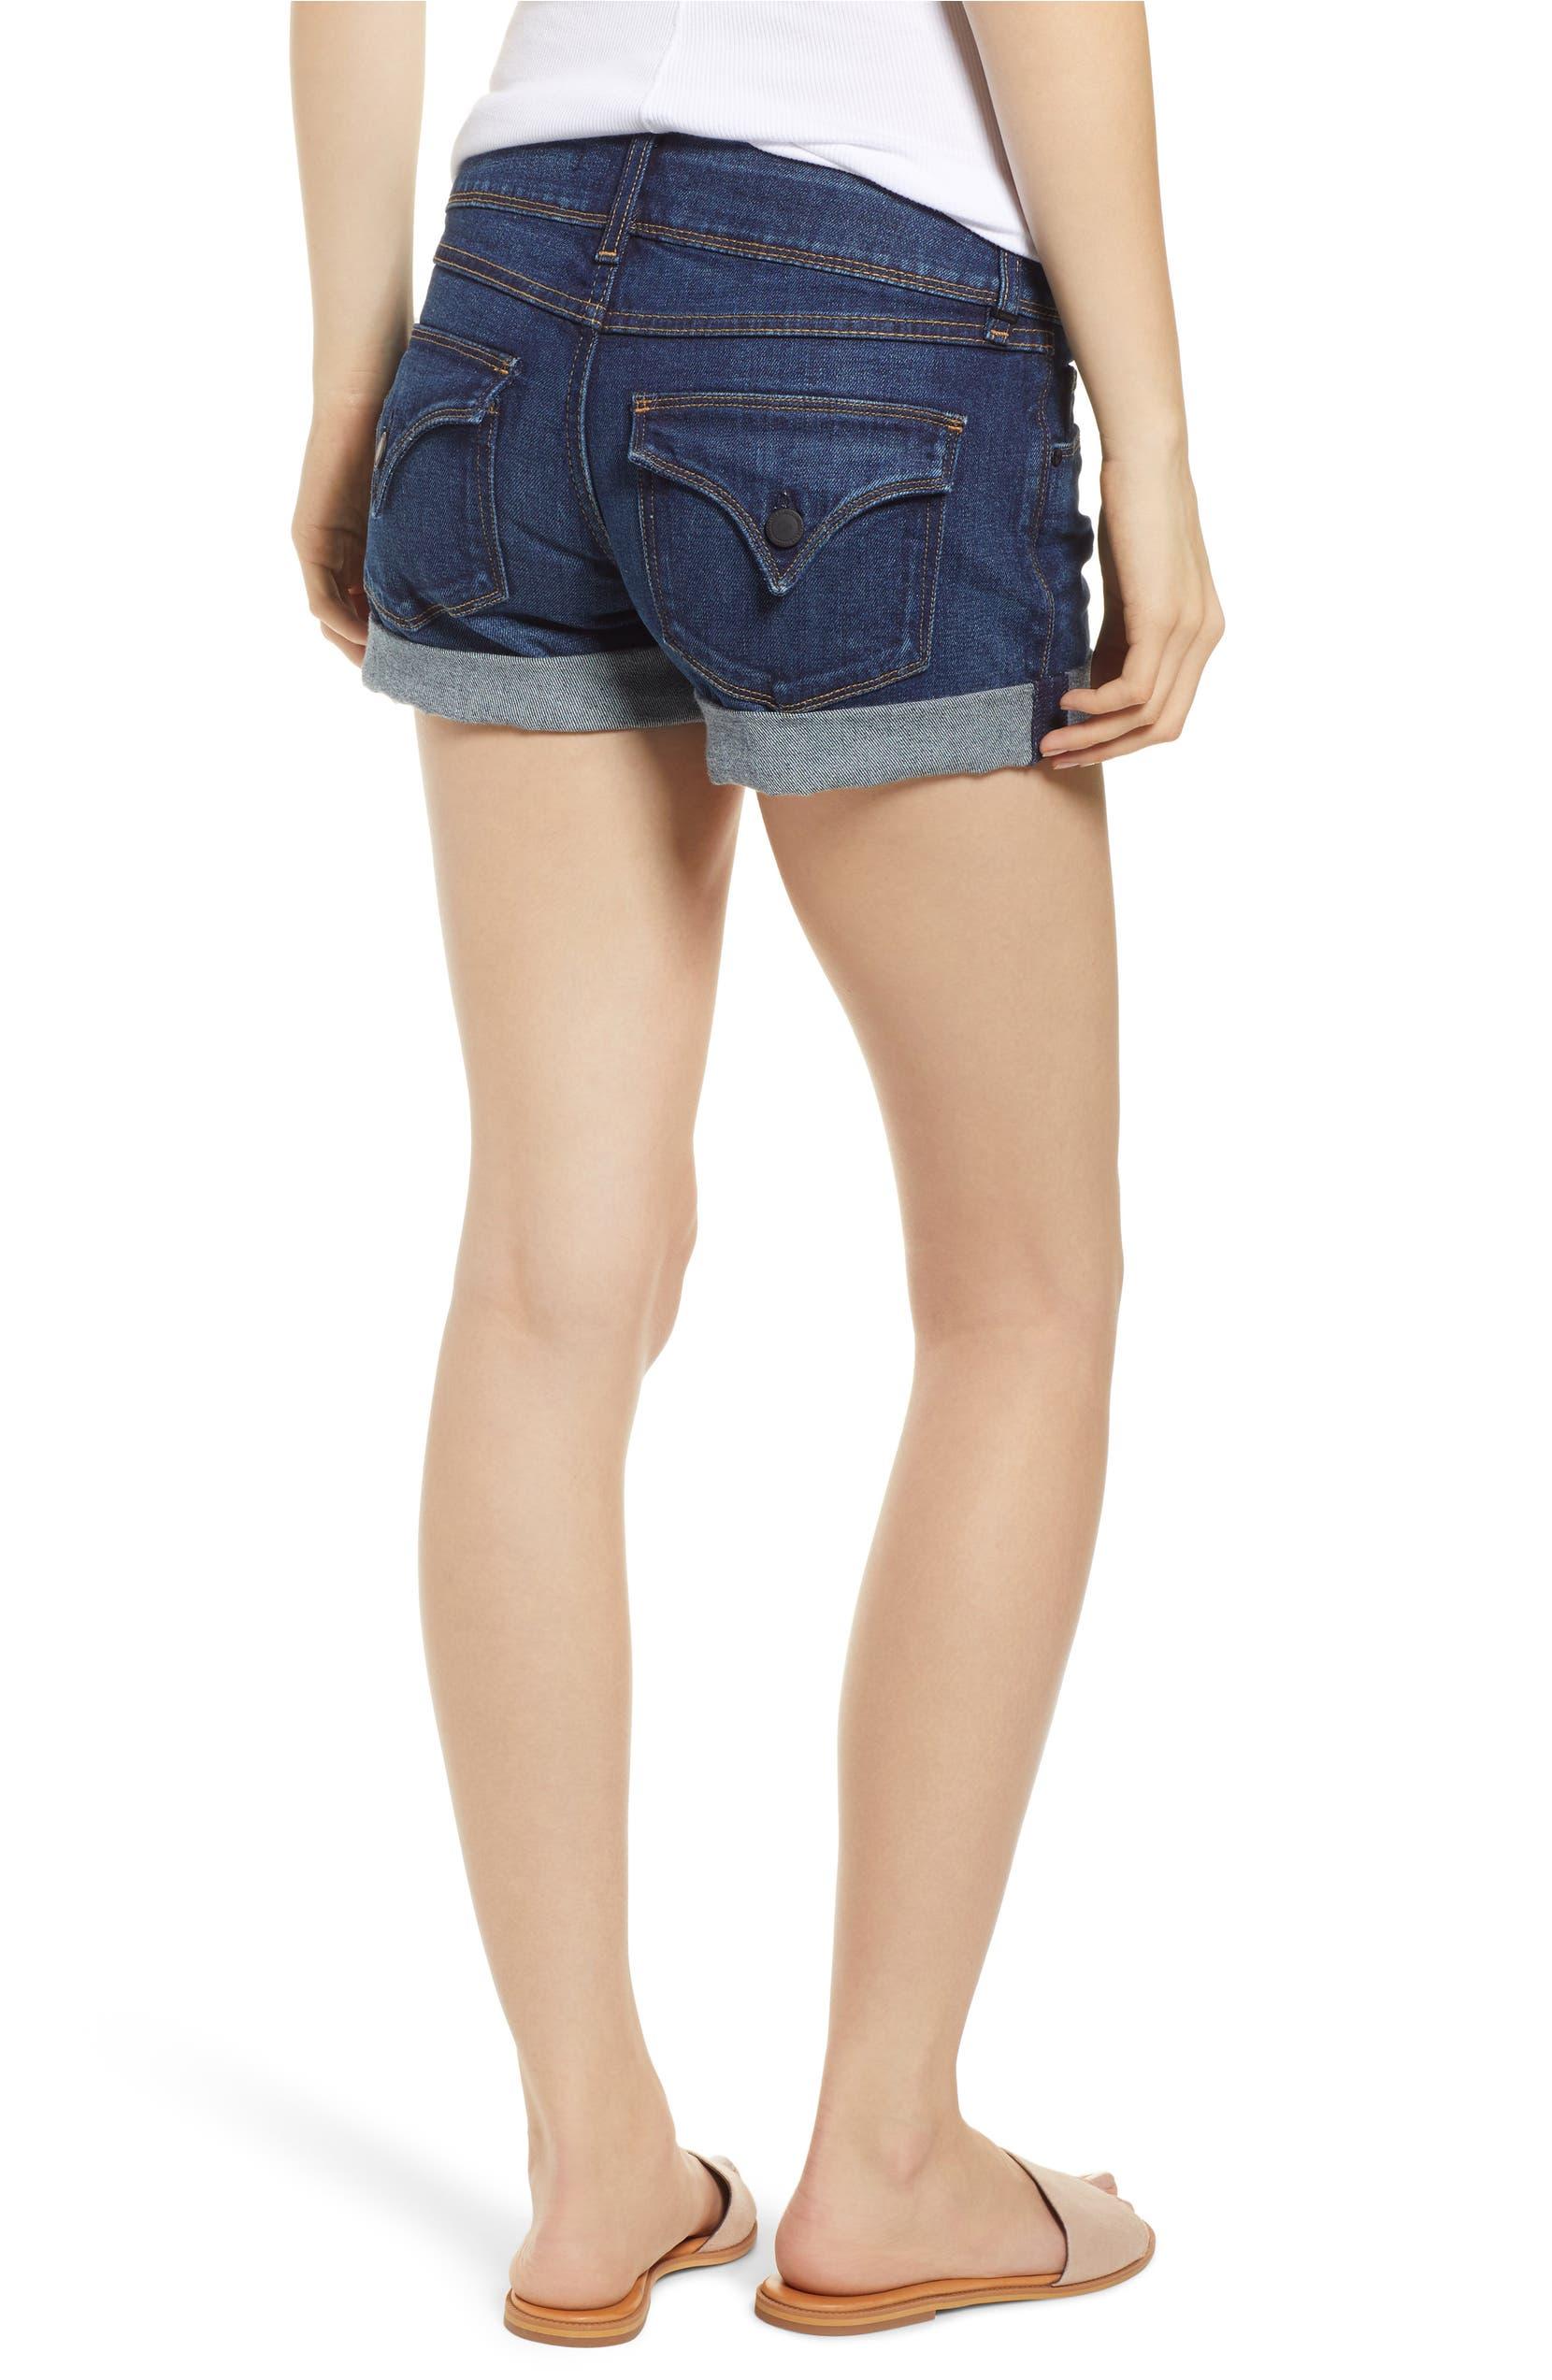 f9772b8beb Hudson Jeans Croxley Cuffed Denim Shorts (Nightfall) | Nordstrom